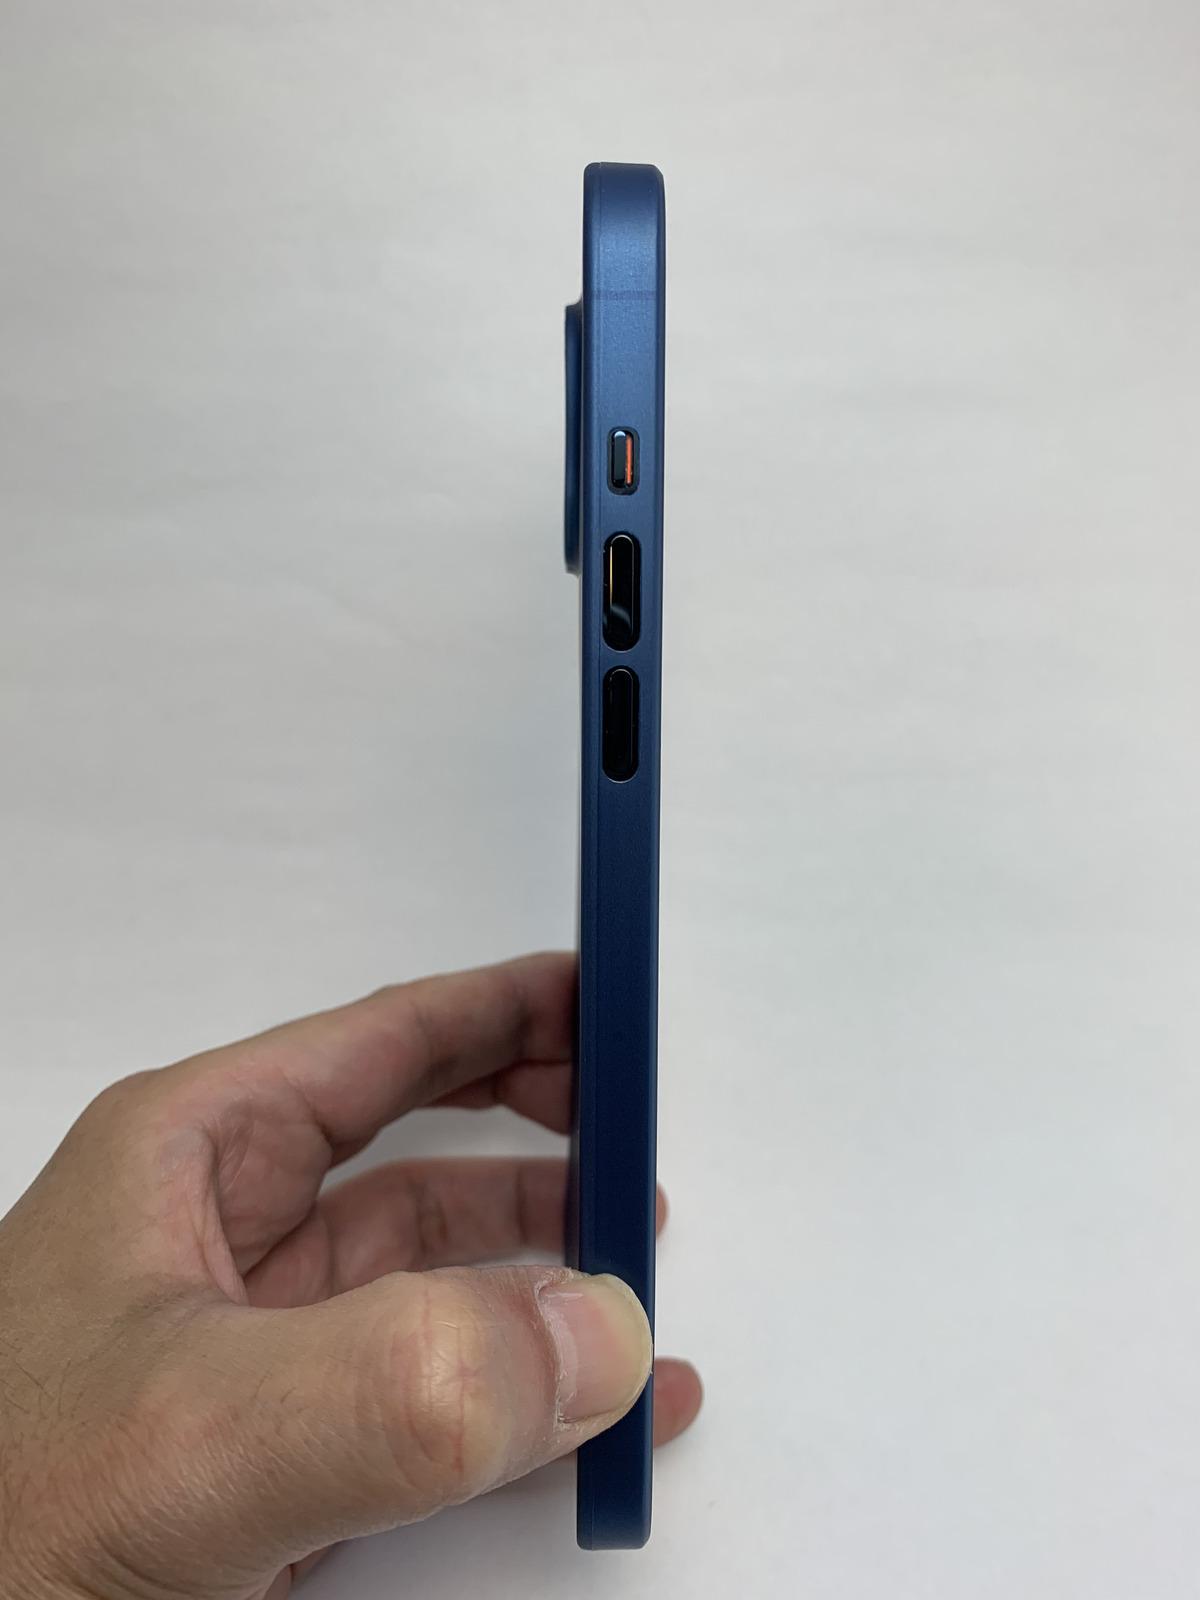 iphone12-case-10-photo-022